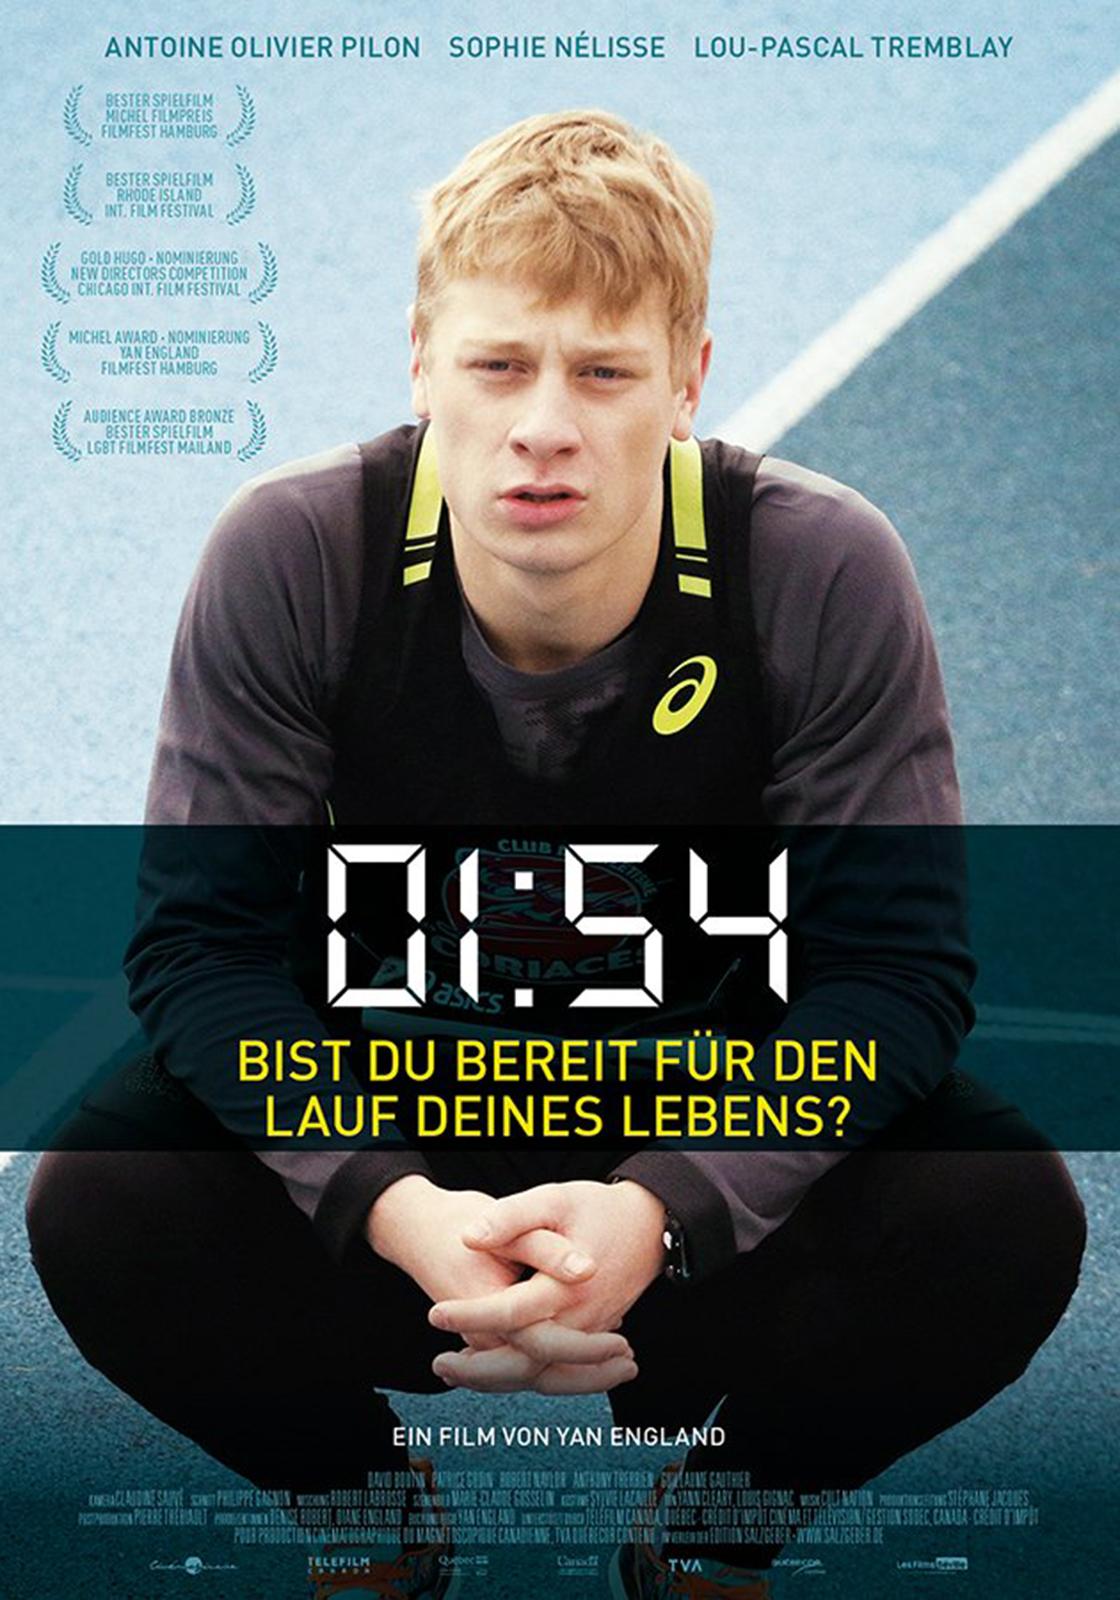 01:54 (DVD)